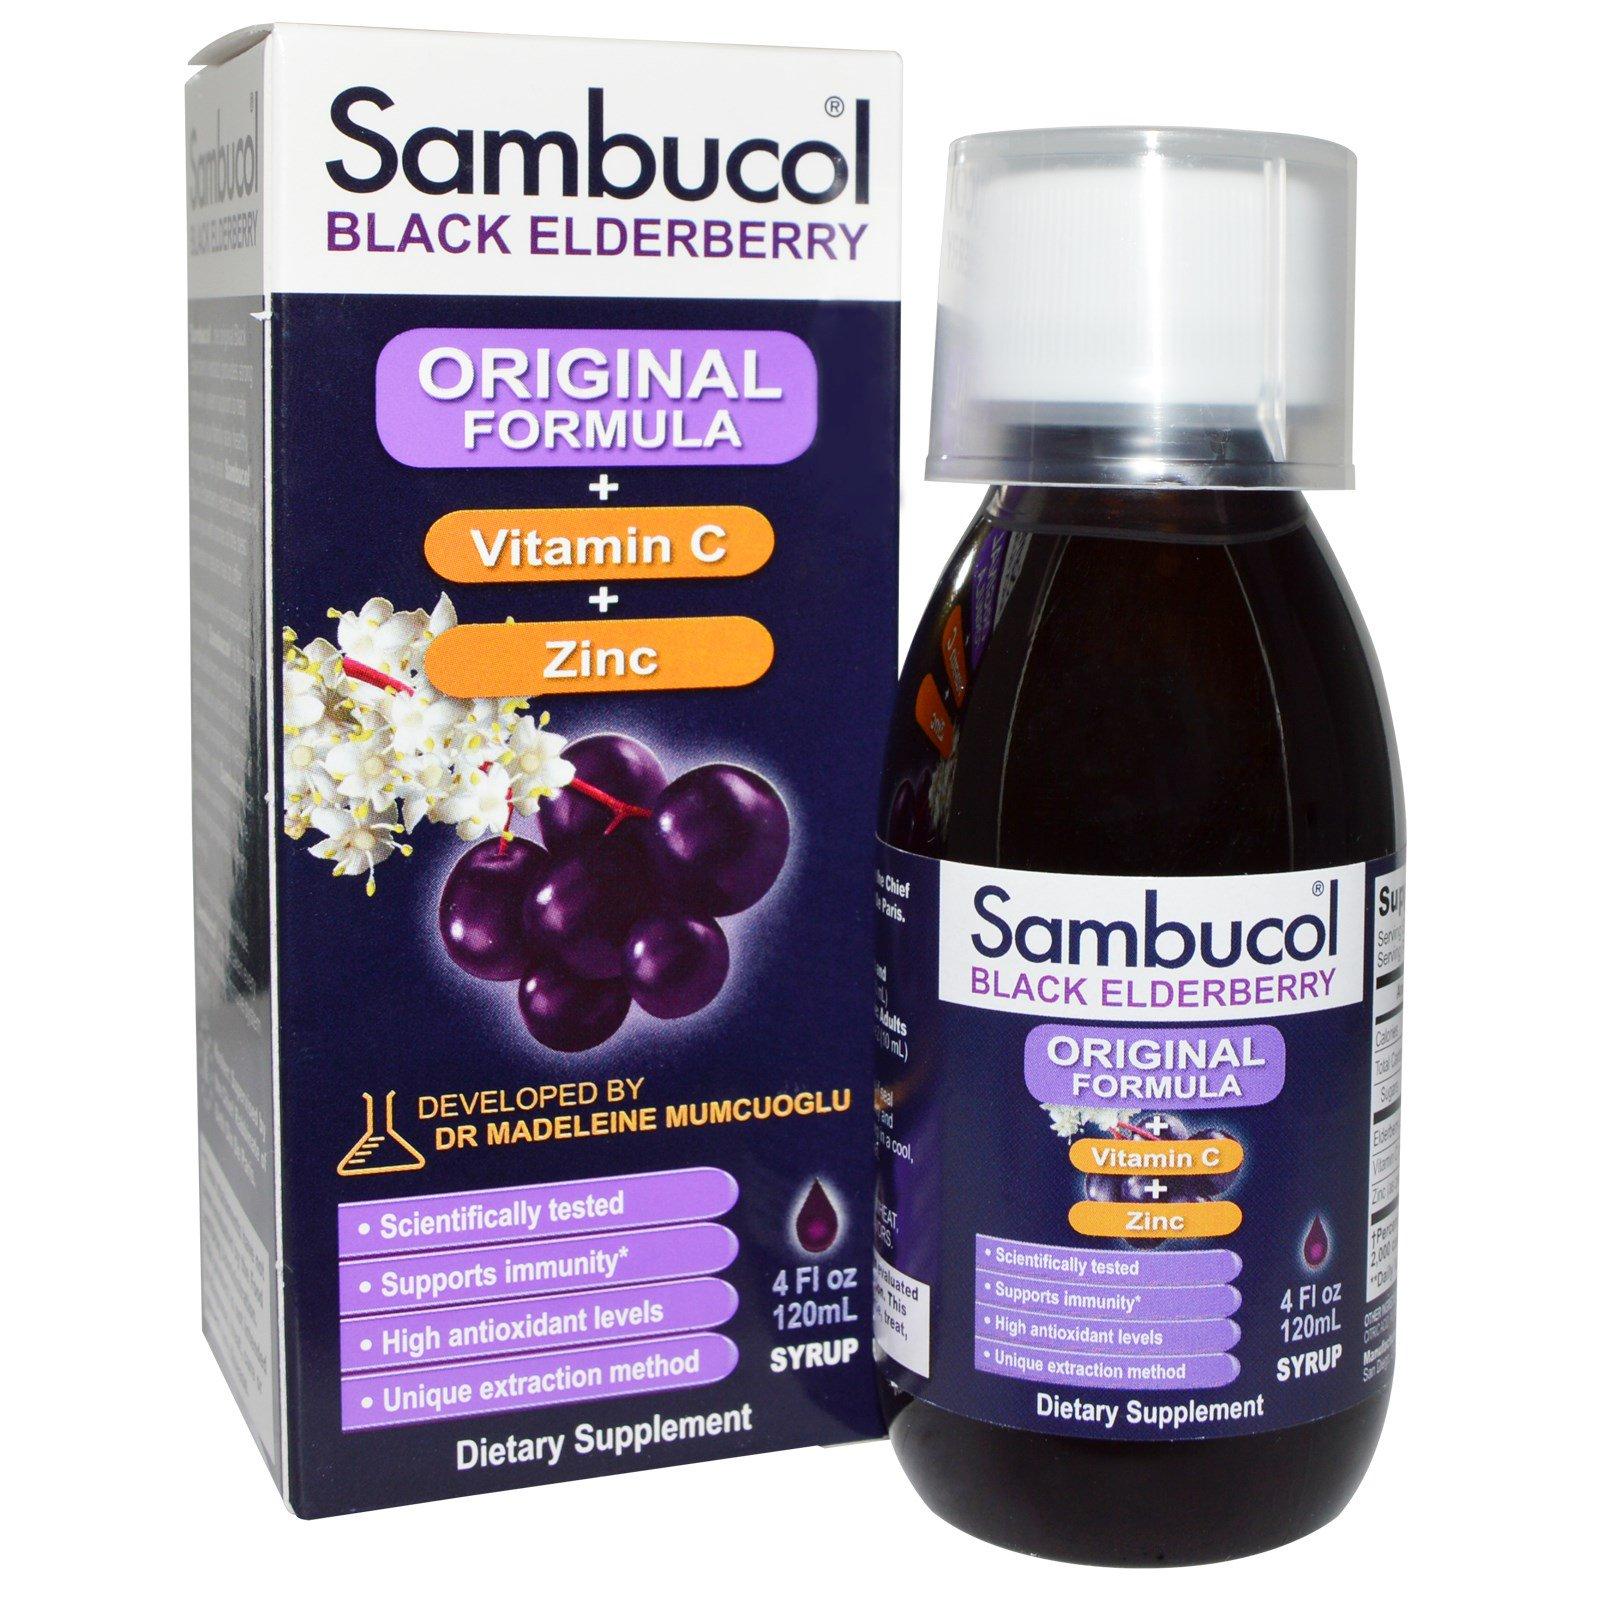 Sambucol, Черная бузина, Оригинальная формула, Витамин С + Цинк, 4 жидкие унции (120 мл)